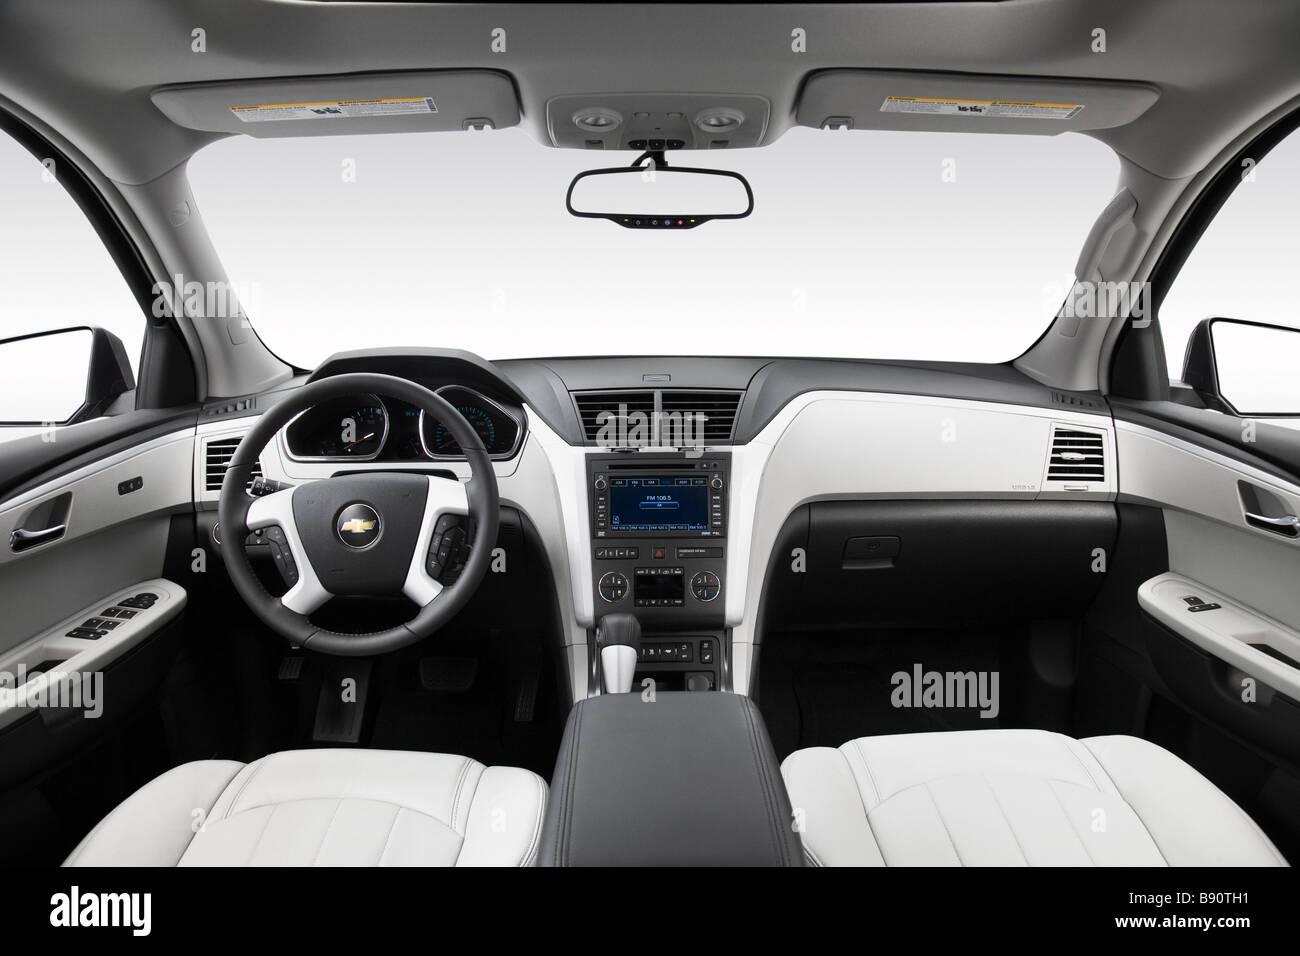 2009 Chevrolet Traverse LTZ in Gray - Dashboard, center console ...